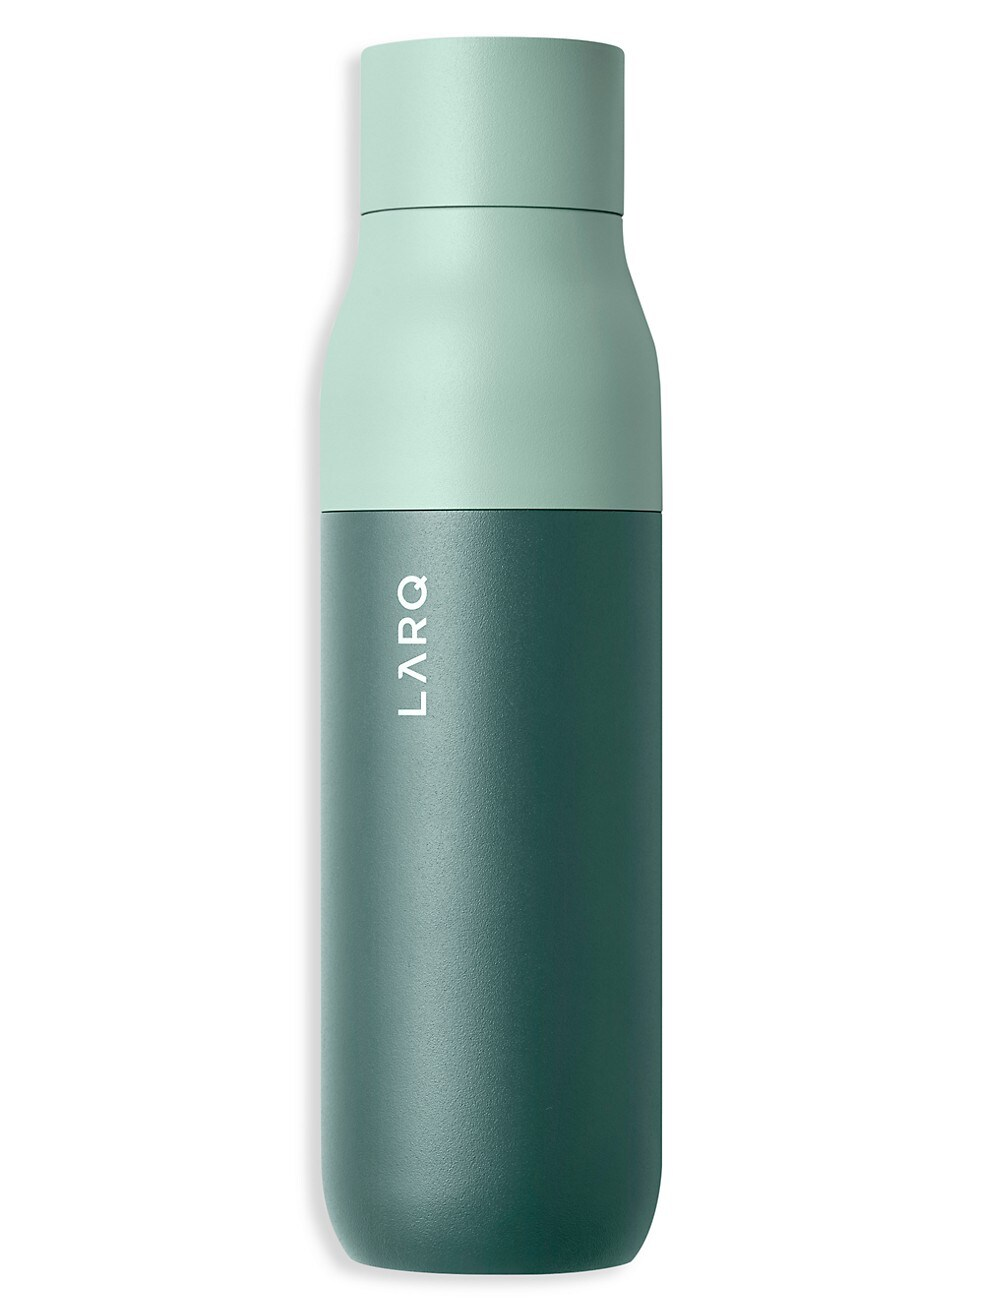 LARQ Special Edition Eucalyptus Green Self Sanitizing Water Bottle